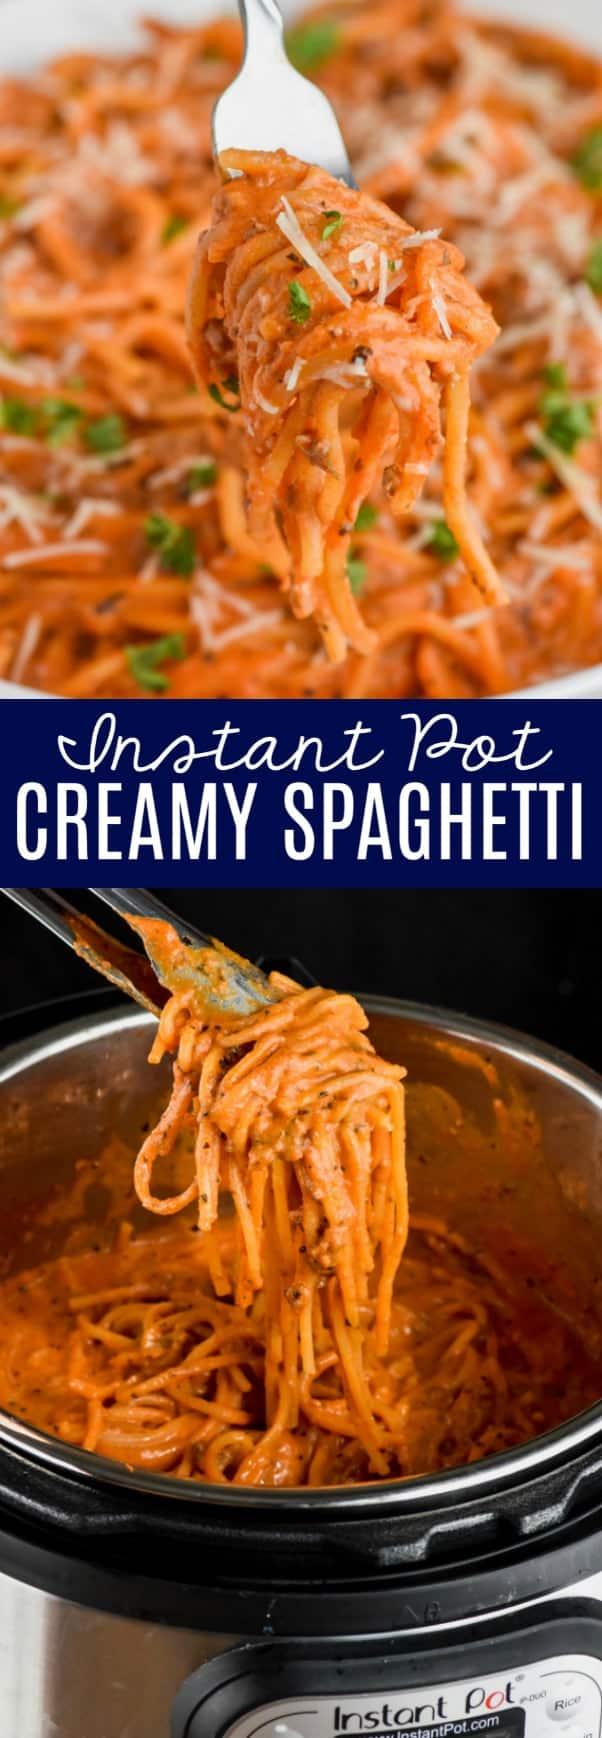 forkful of creamy instant pot spaghetti